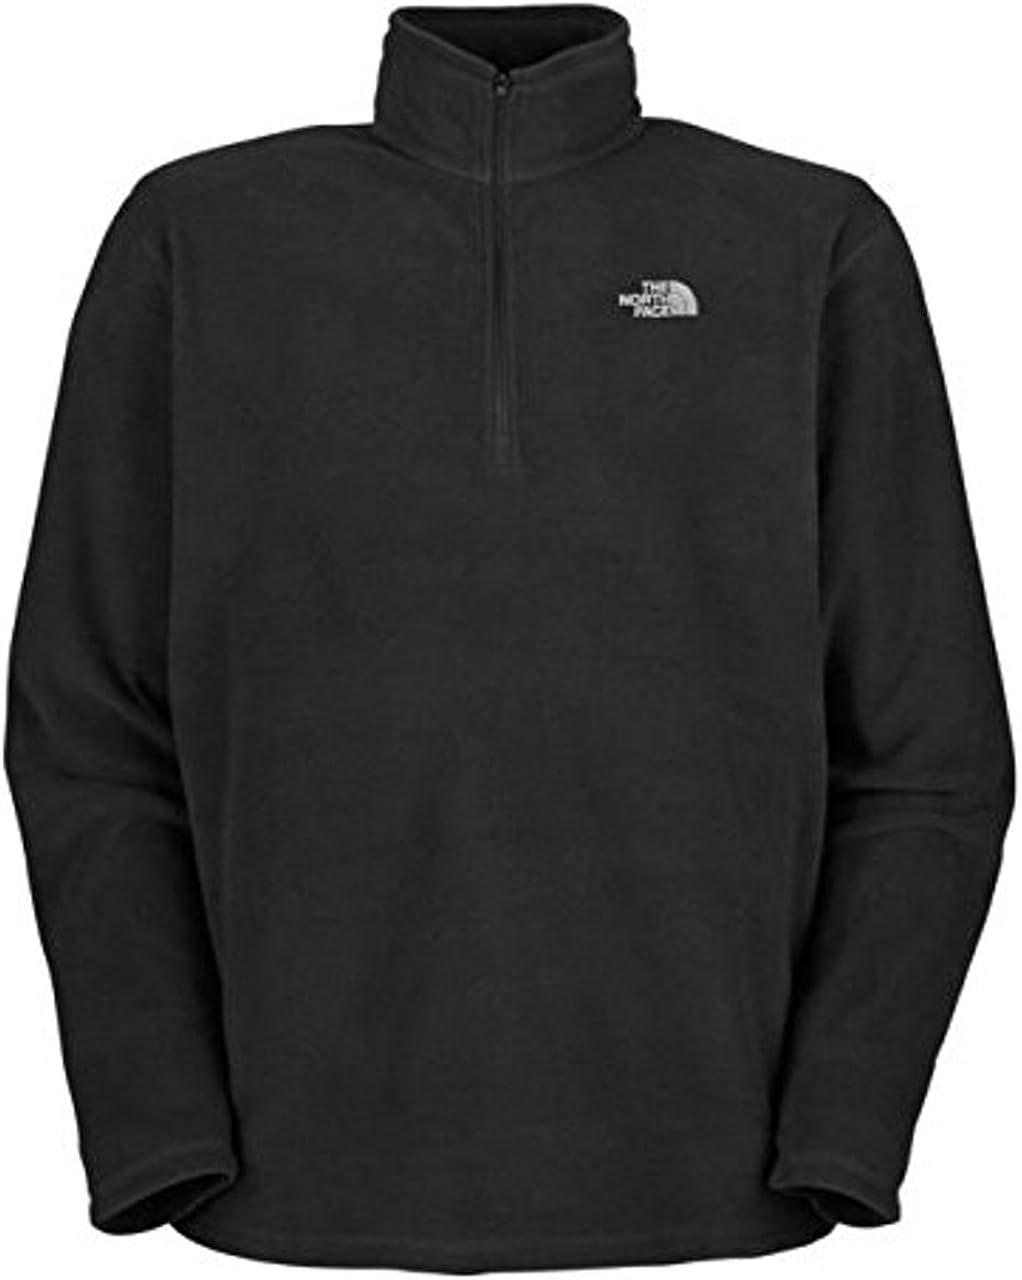 The North Face Men's Glacier 1/4 Zip Fleece Jacket Size L Black